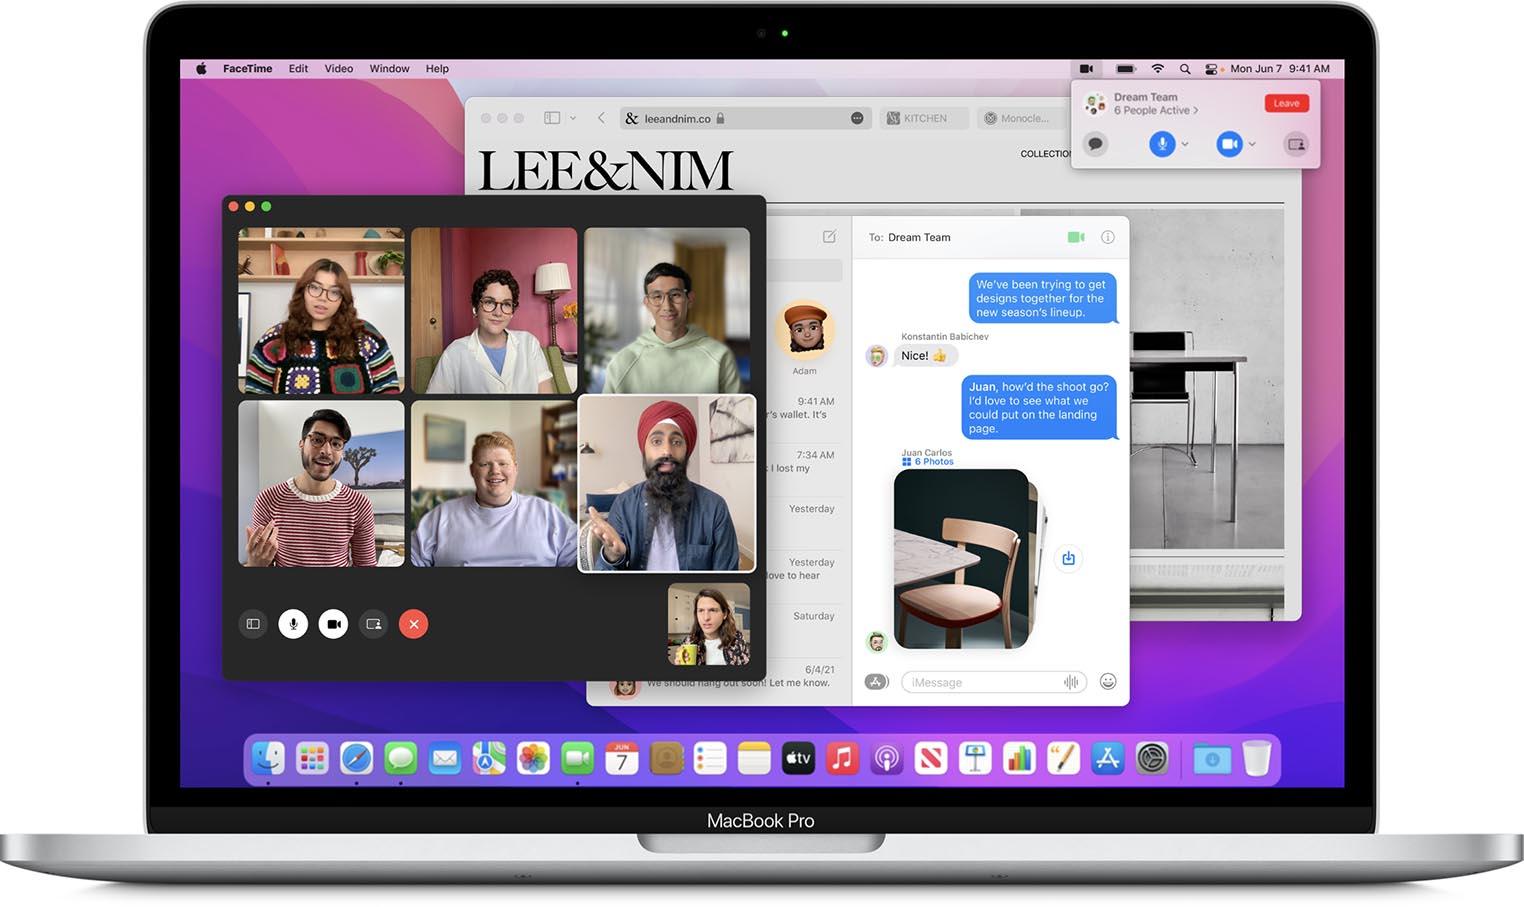 MacBook Pro FaceTime macOS Monterey